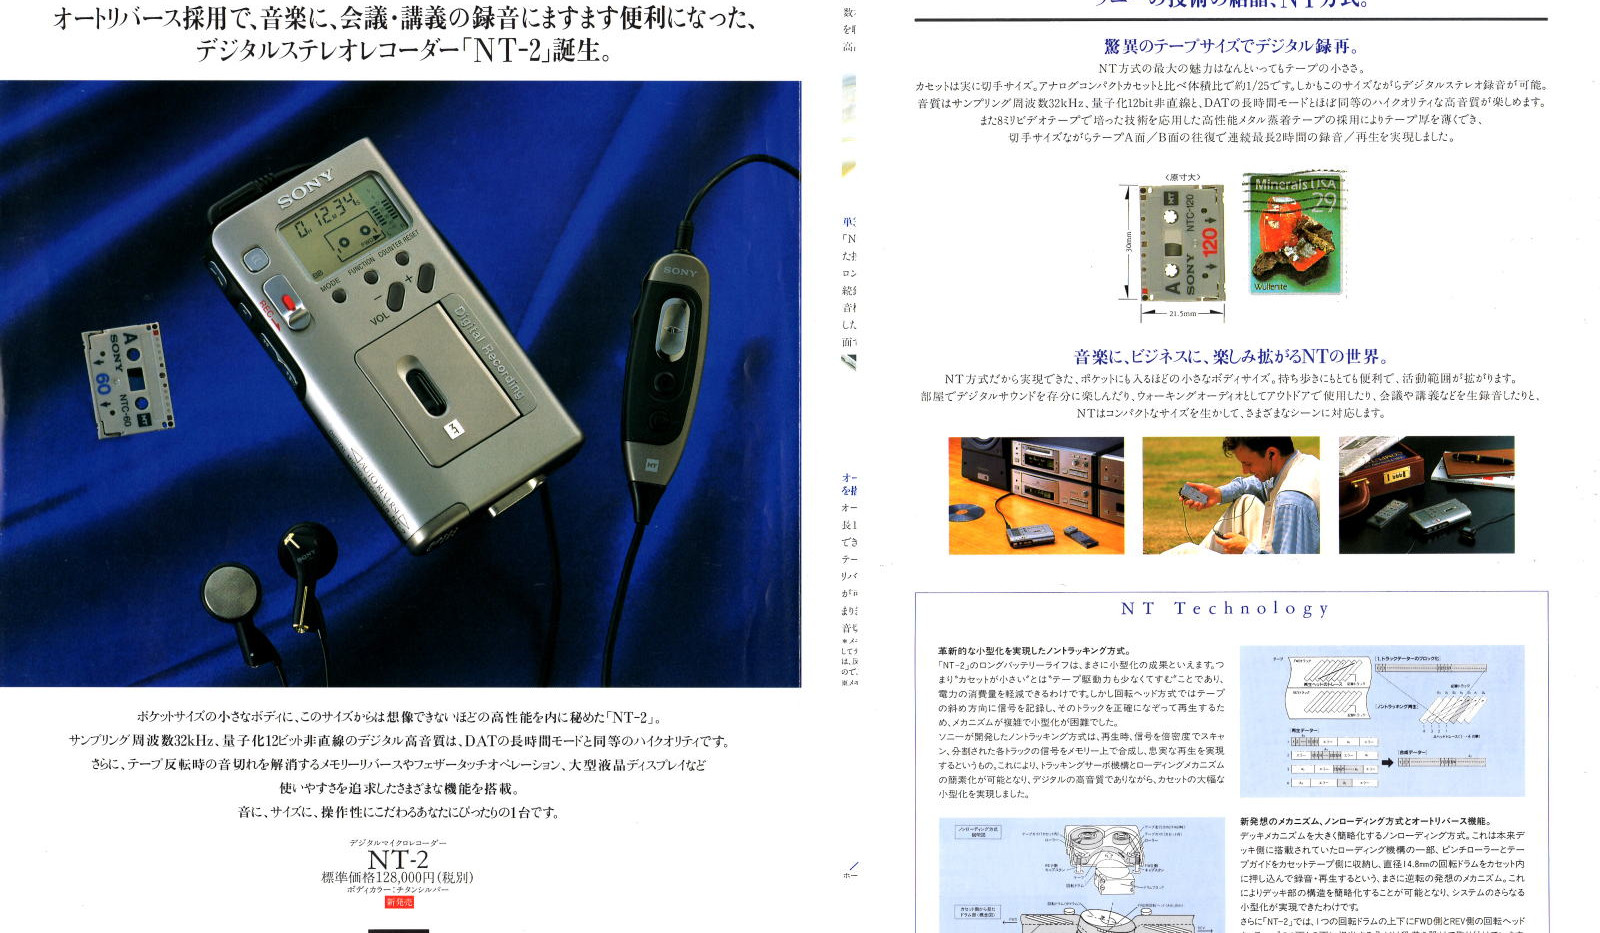 19951.10-NT-2-NTU-S1-DC.jpg